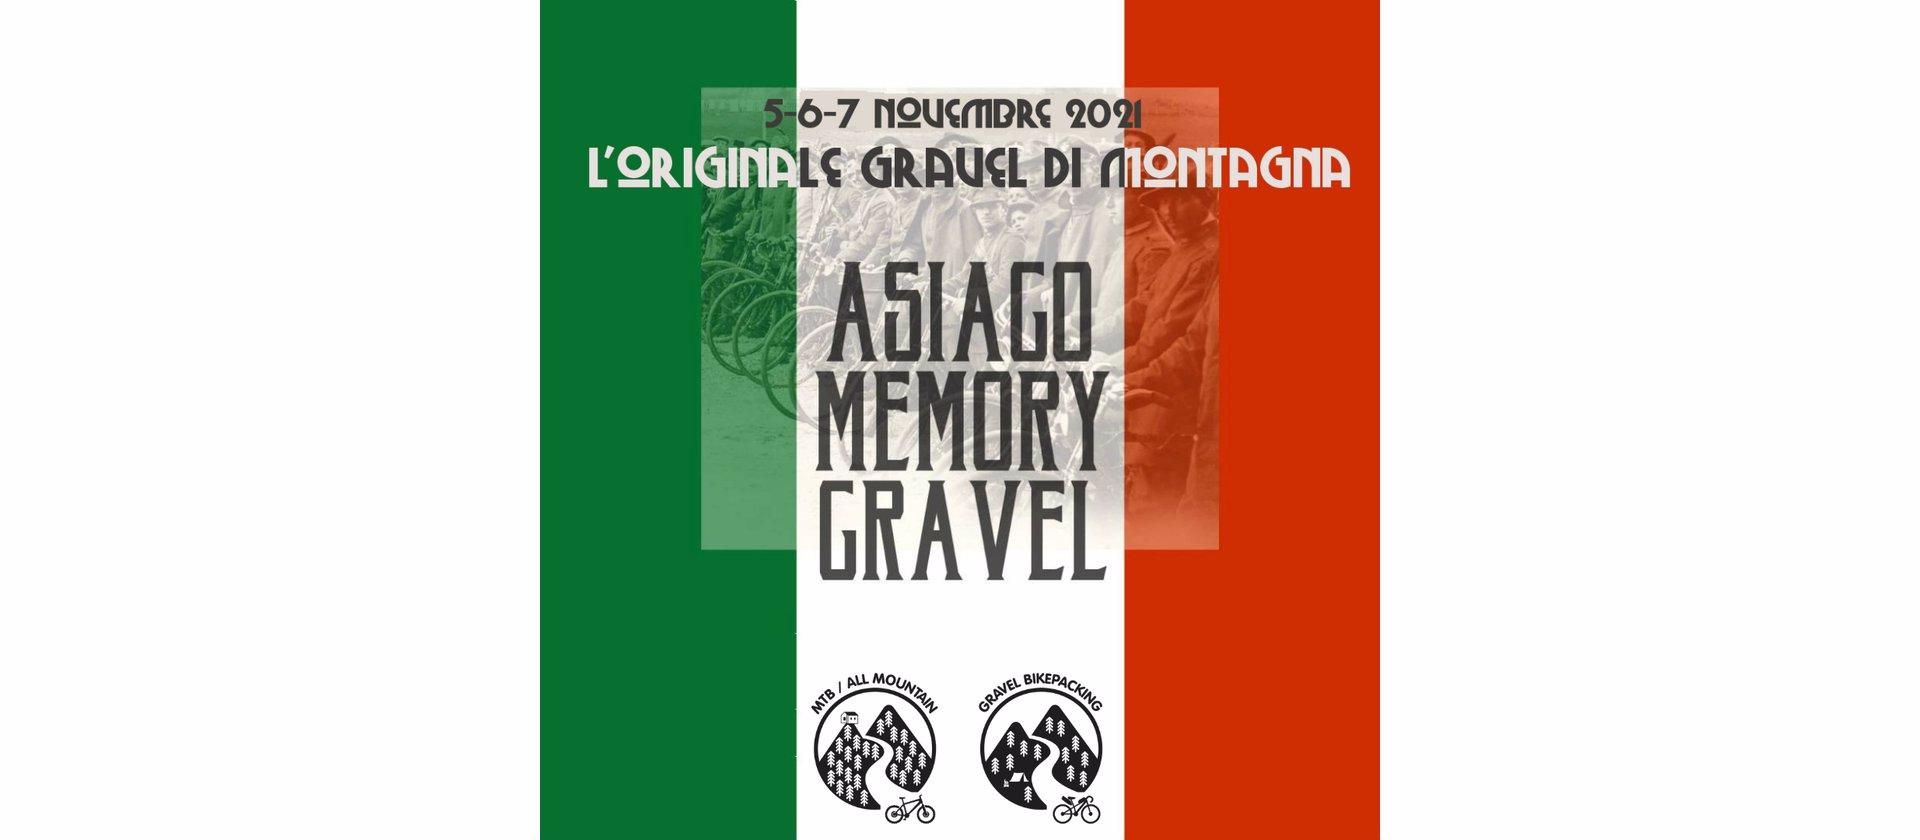 asiago memory gravel w